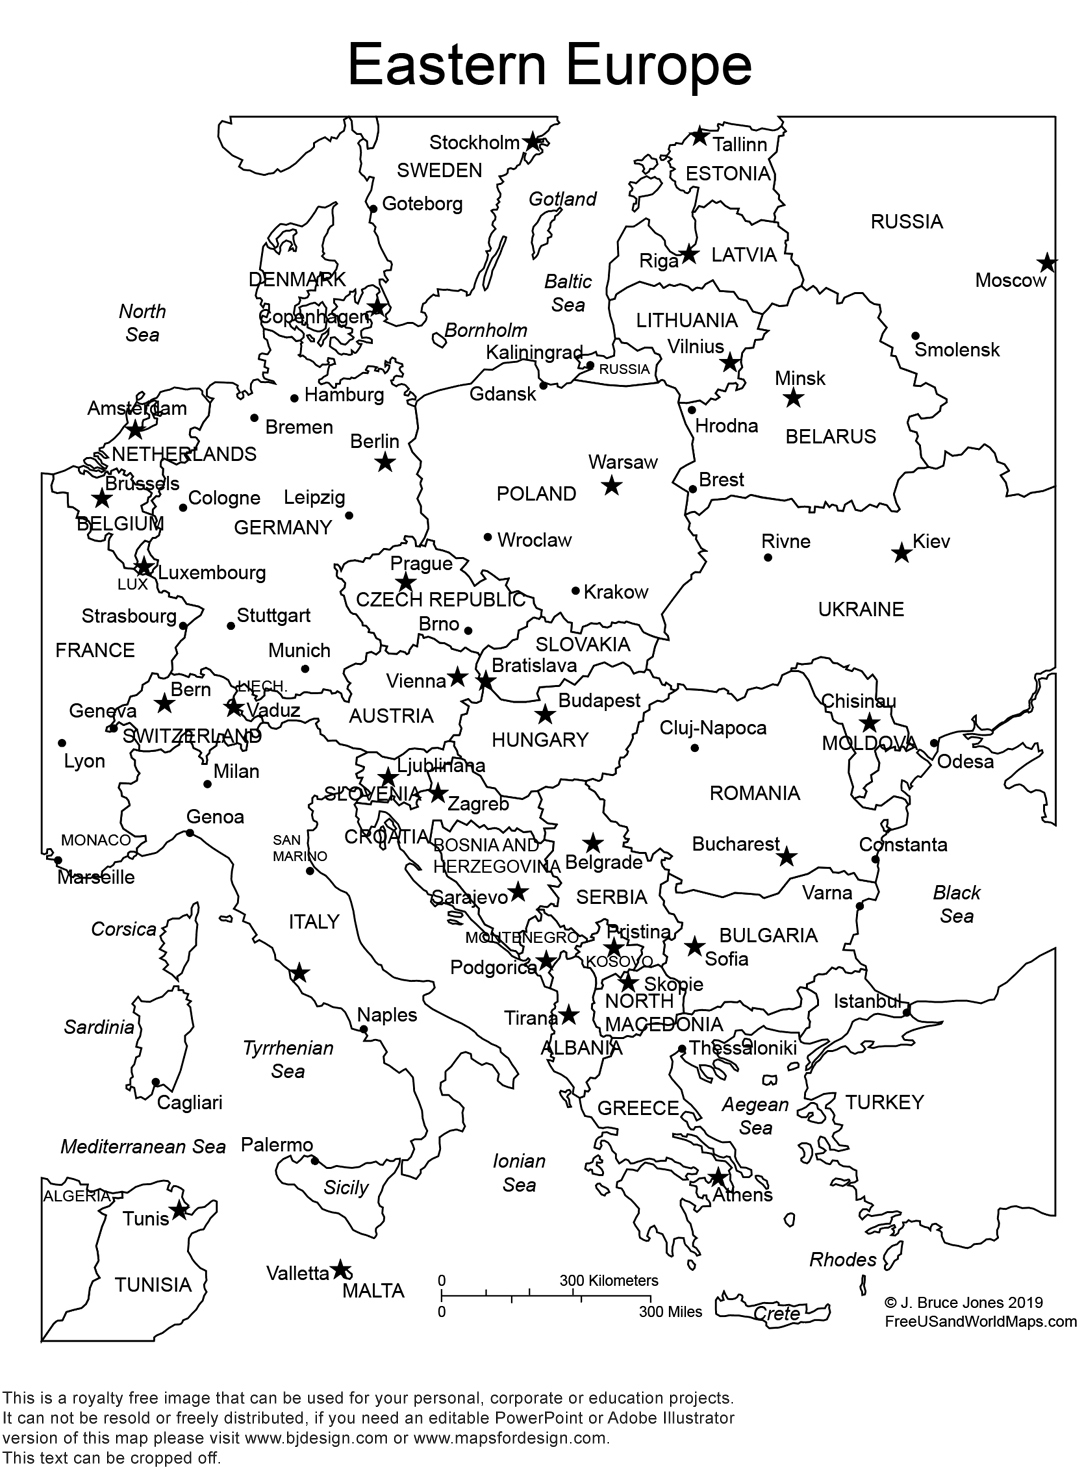 World Regional Europe Printable, Blank Maps • Royalty Free, jpg ...